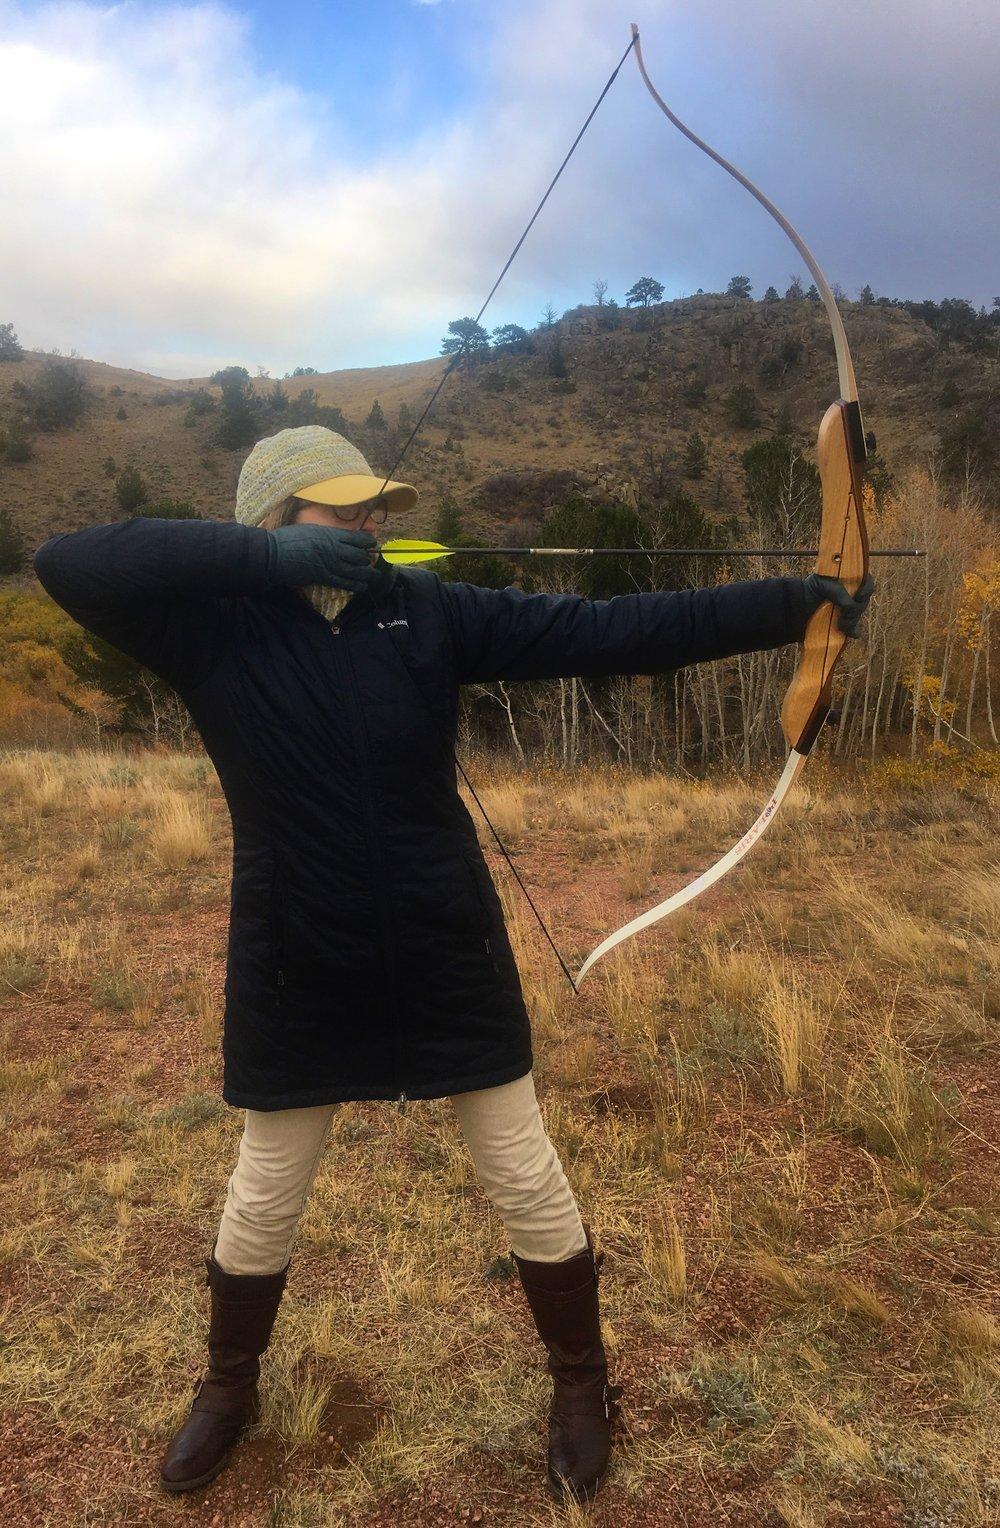 Diana (Barbara) the Roman goddess of the hunt gets a bullseye